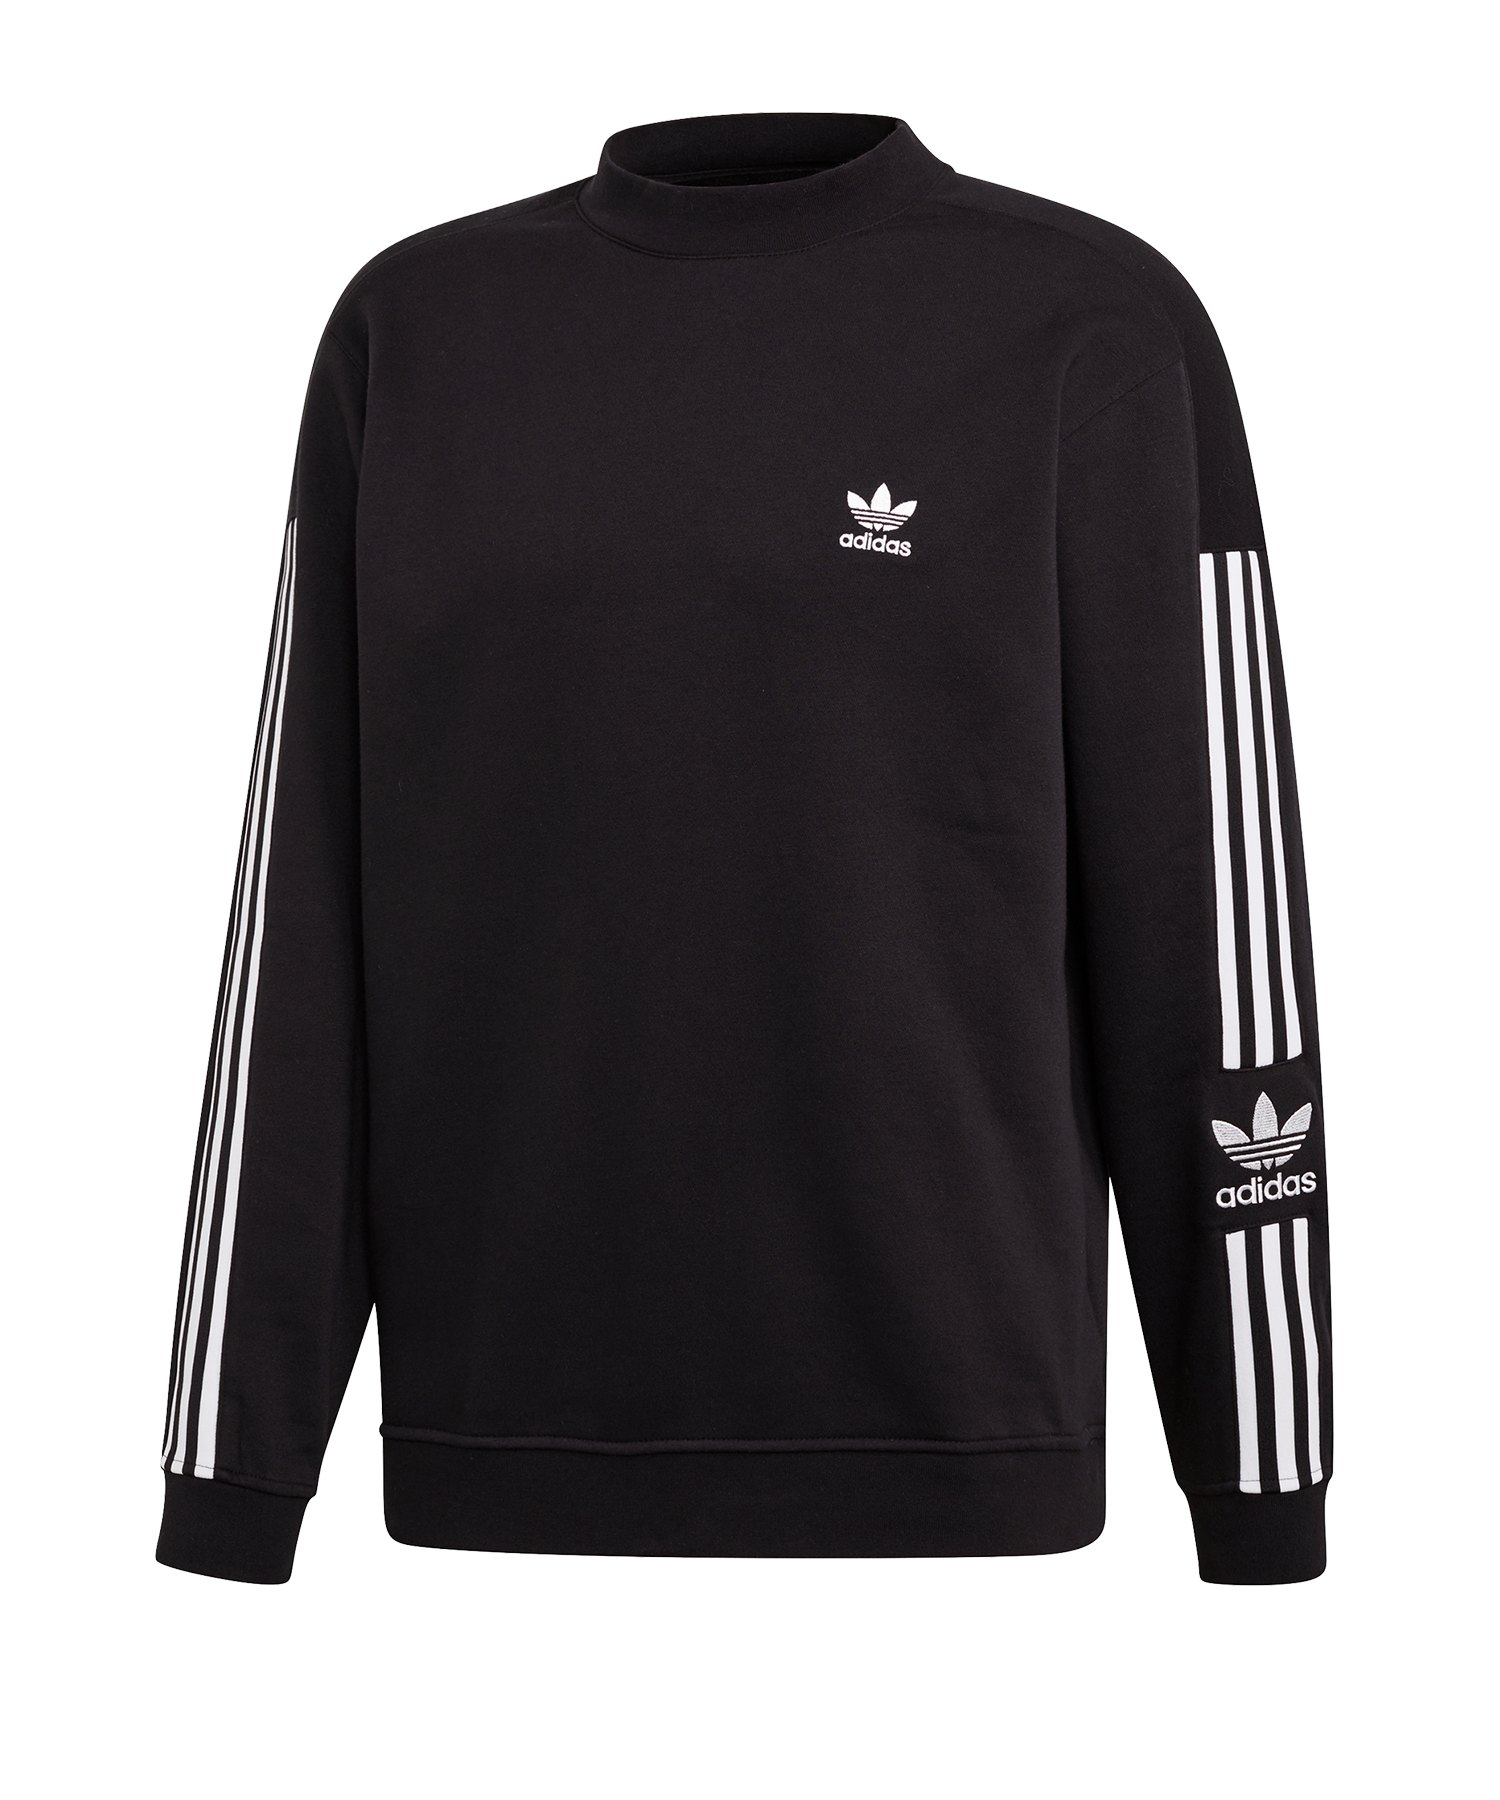 adidas Originals Crew Sweatshirt Schwarz